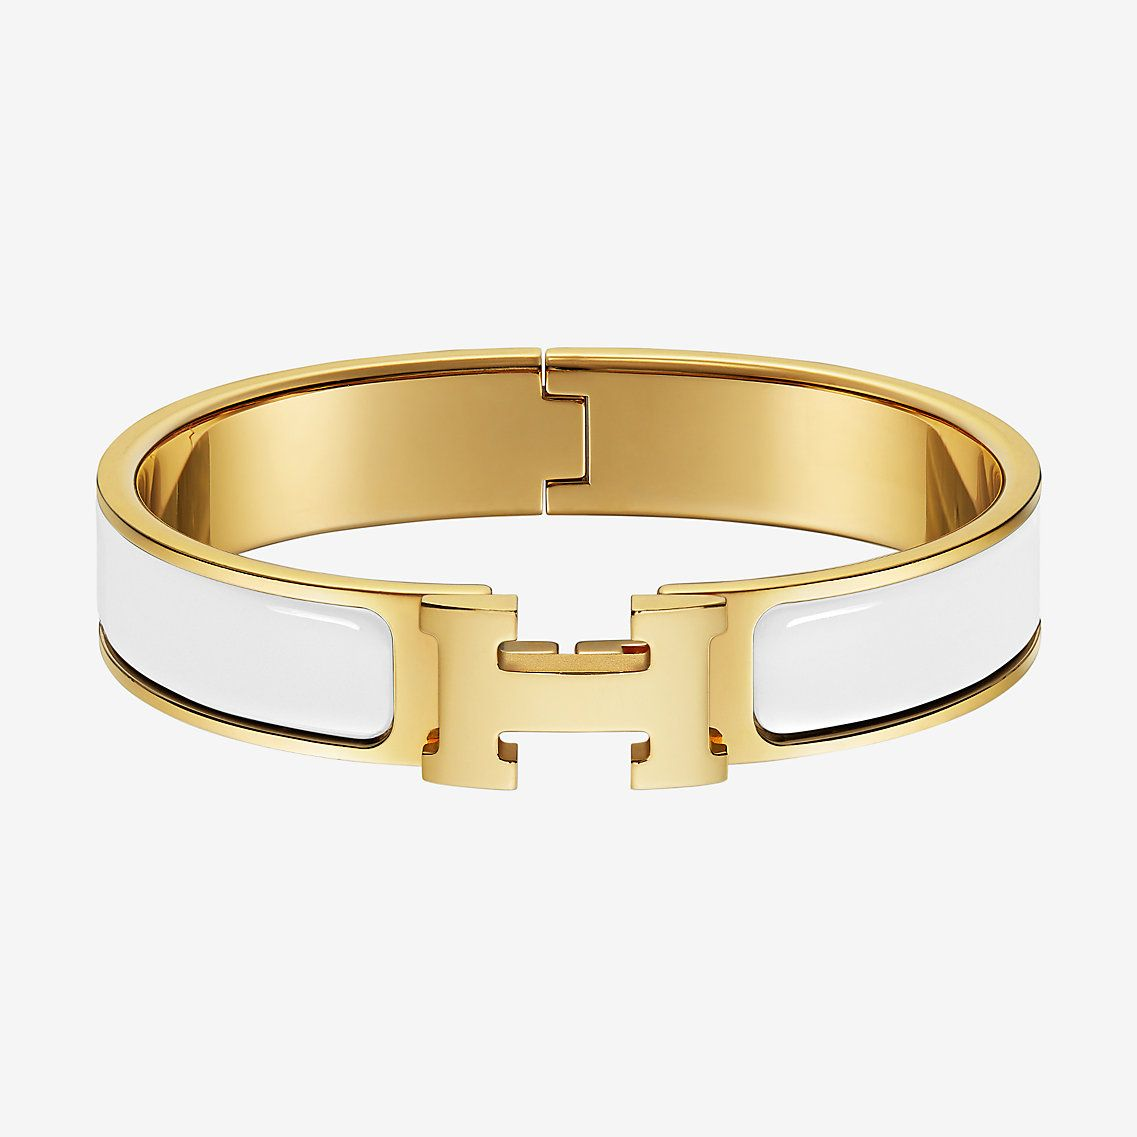 476ff07c3d34 Clic H bracelet in 2019